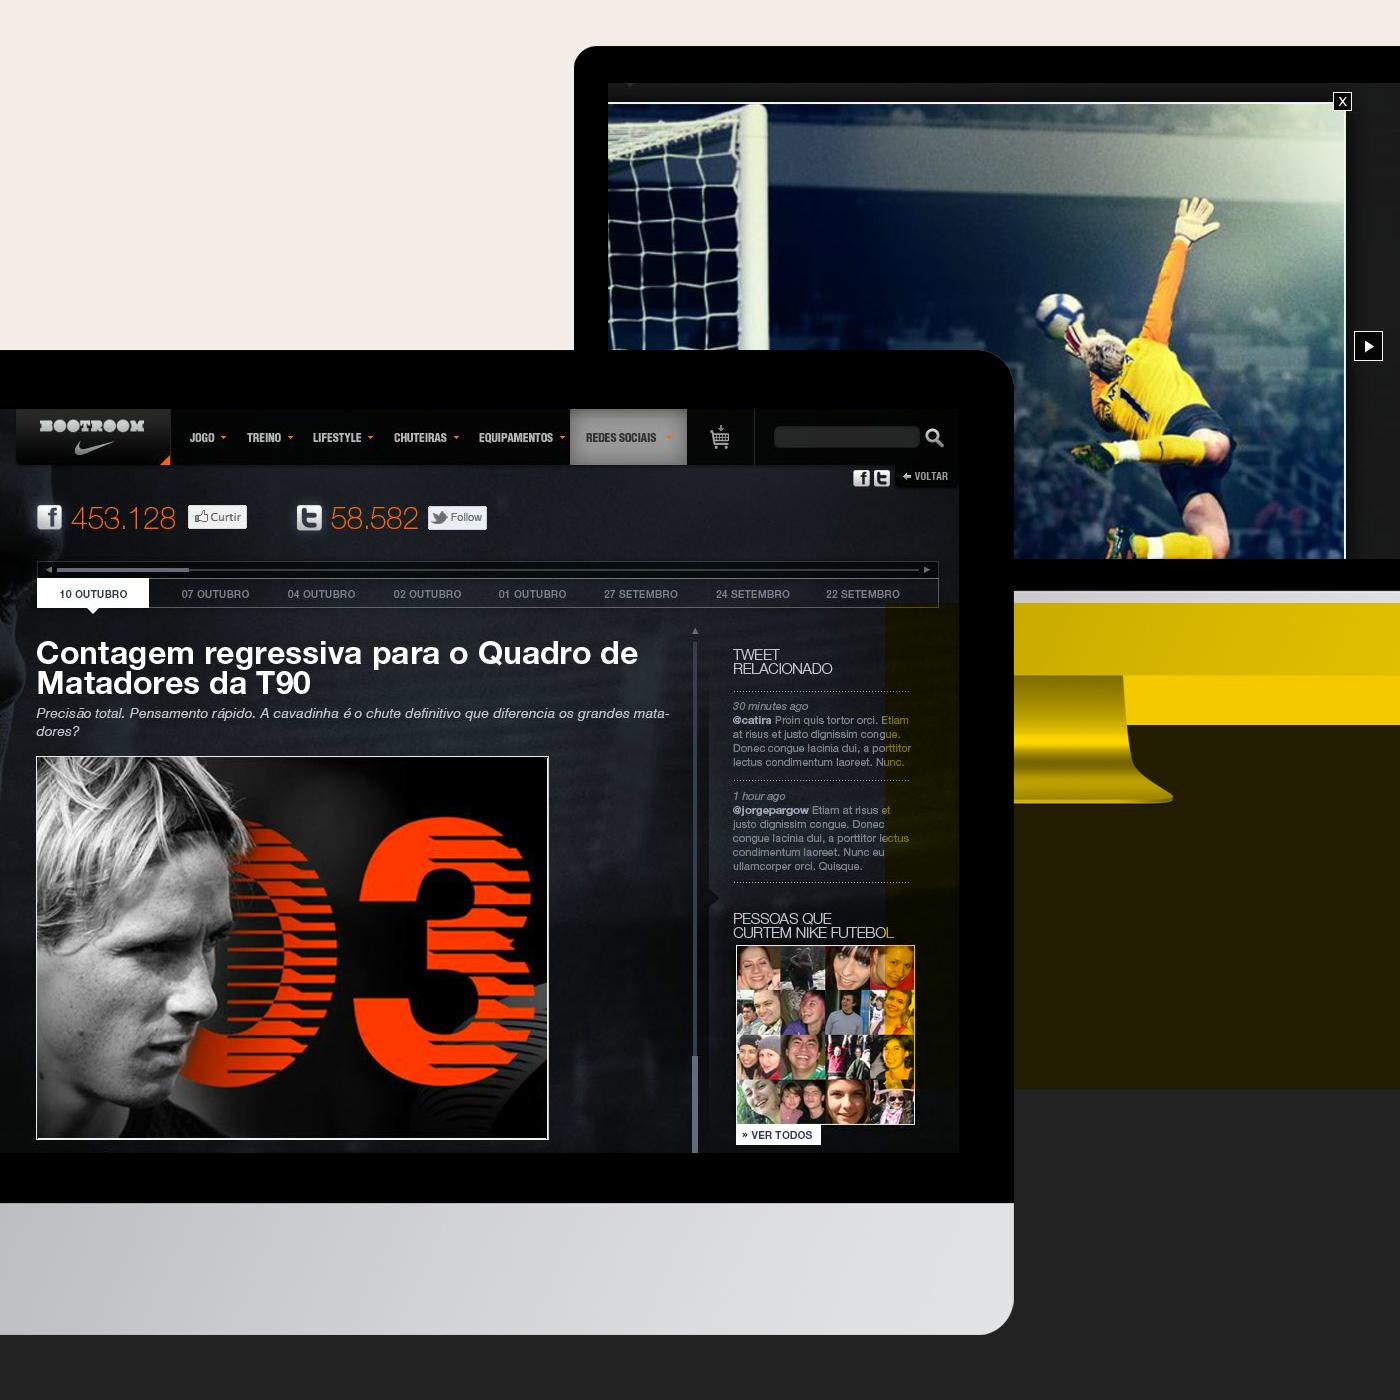 Nike Bootroom Brasil netshoes sales Brazil vancouver british columbia football